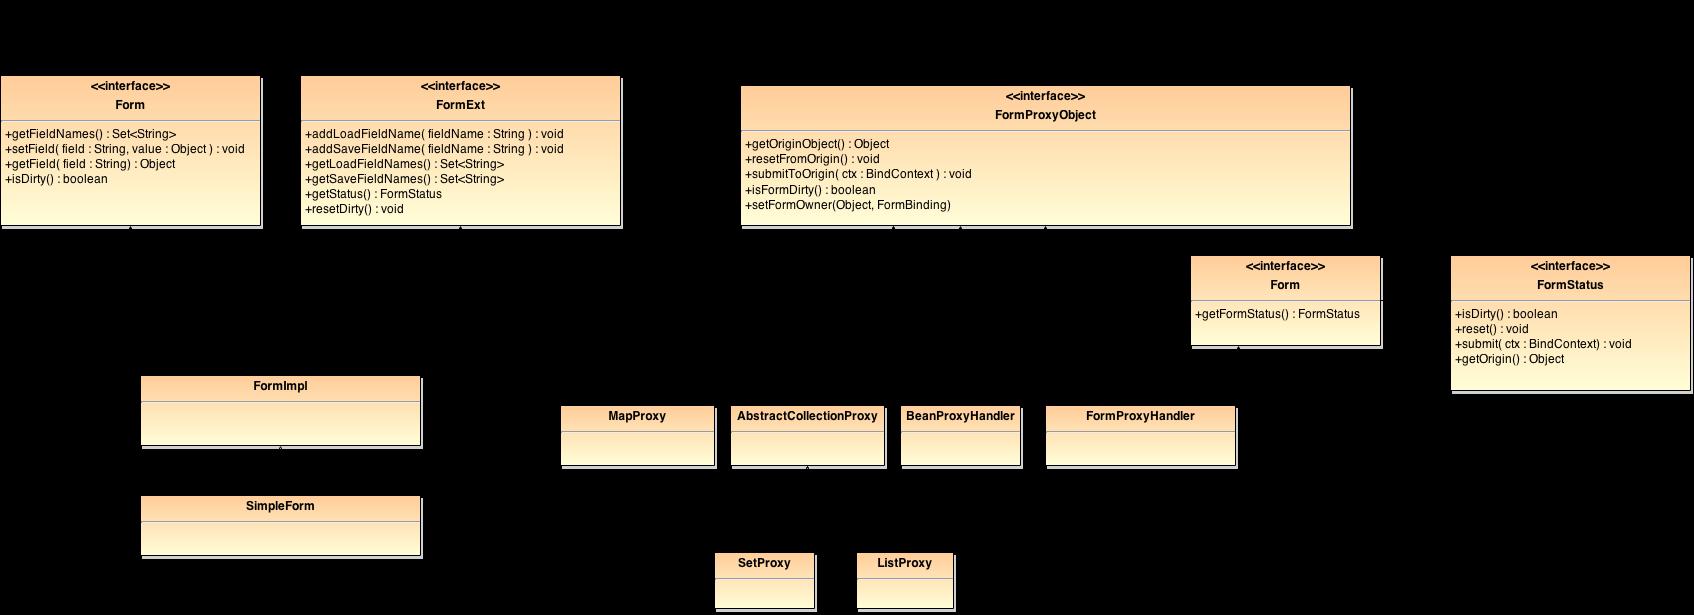 Form Class Diagram